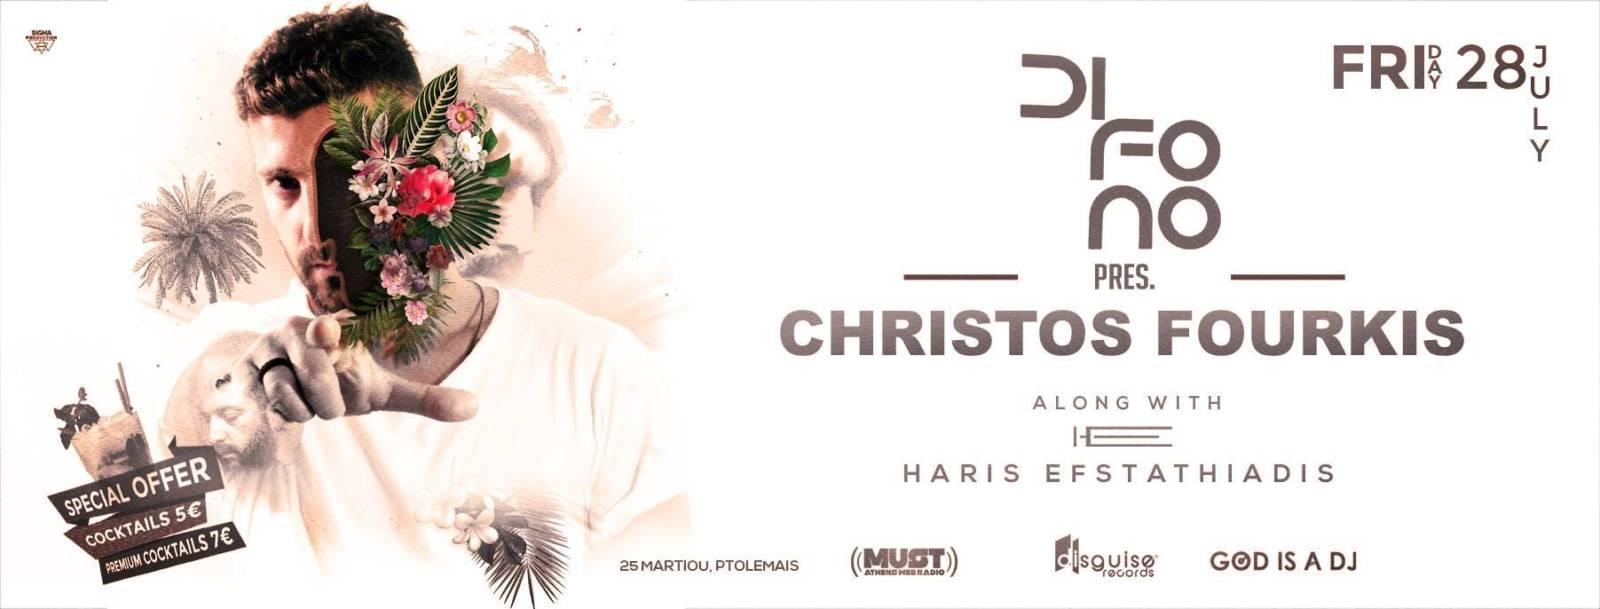 Cocktails night  με τον Christo Fourki στο  Difono Cafe Bar στην Πτολεμαΐδα, την Παρασκευή 28 Ιουλίου